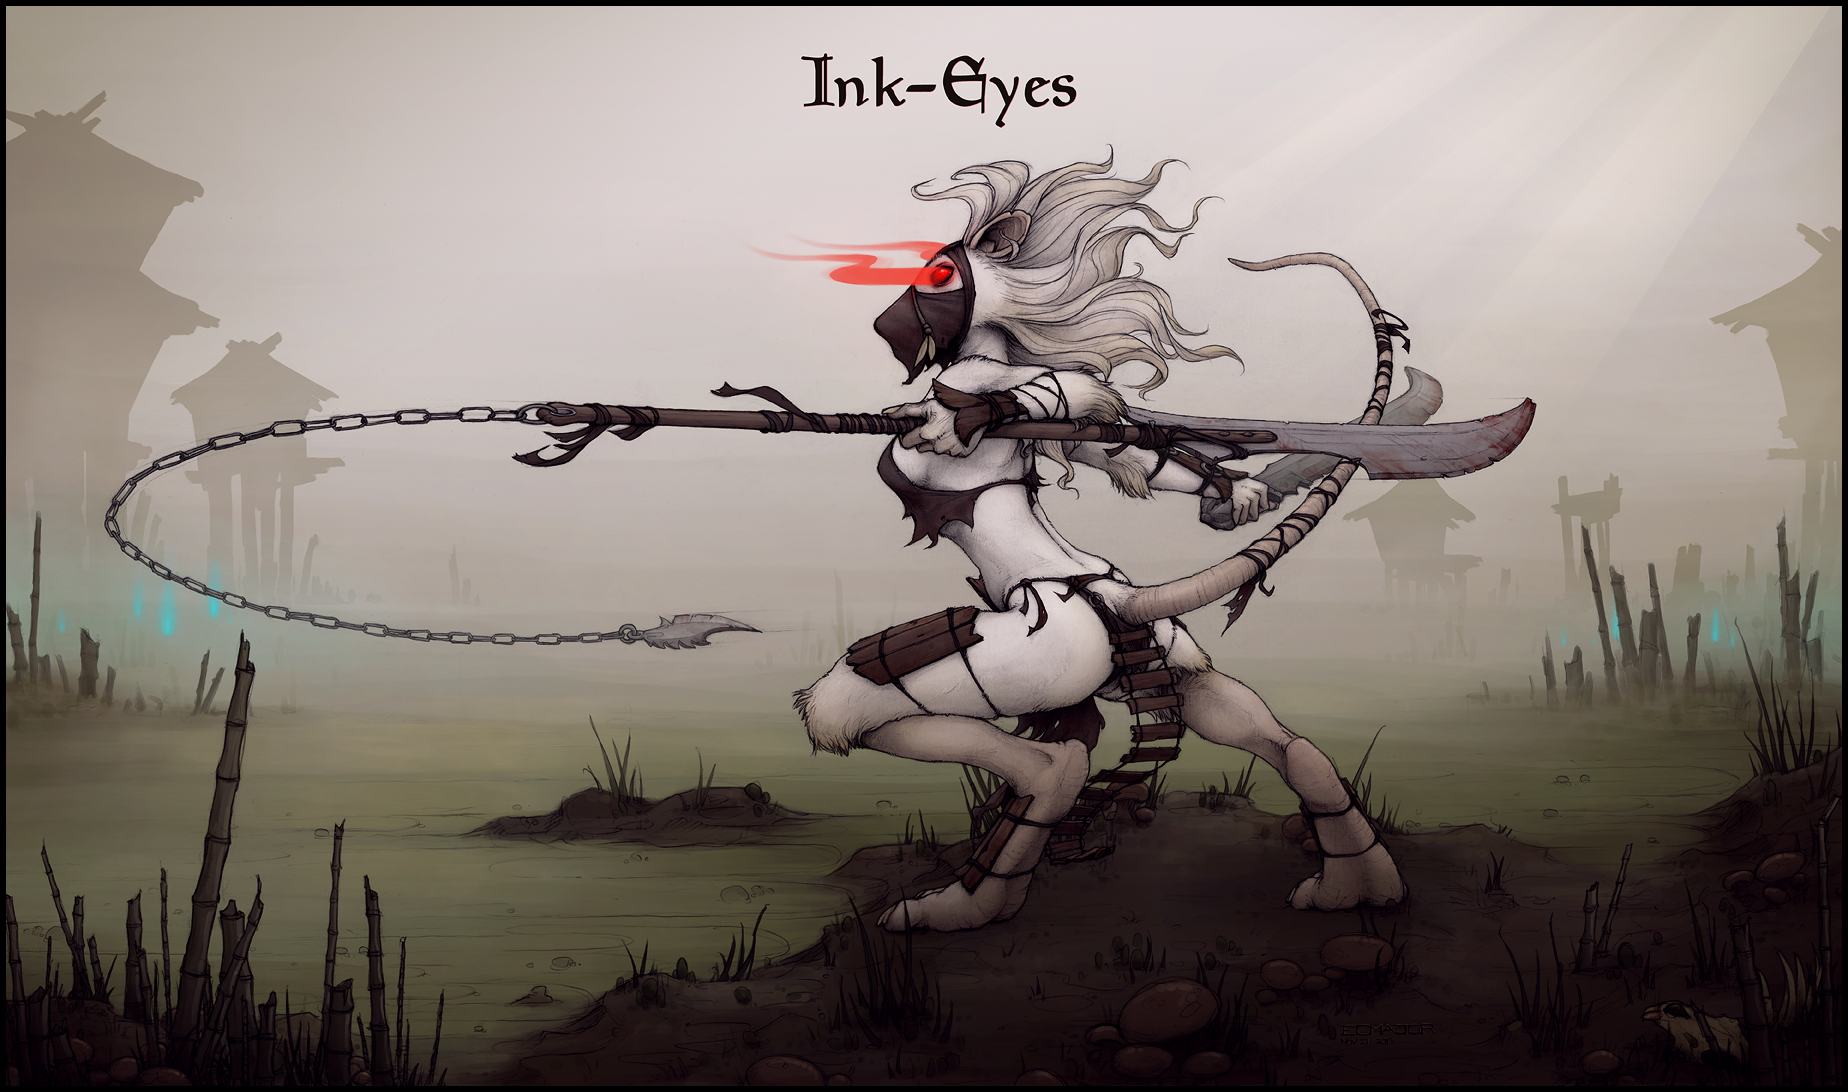 Ink-Eyes by ecmajor